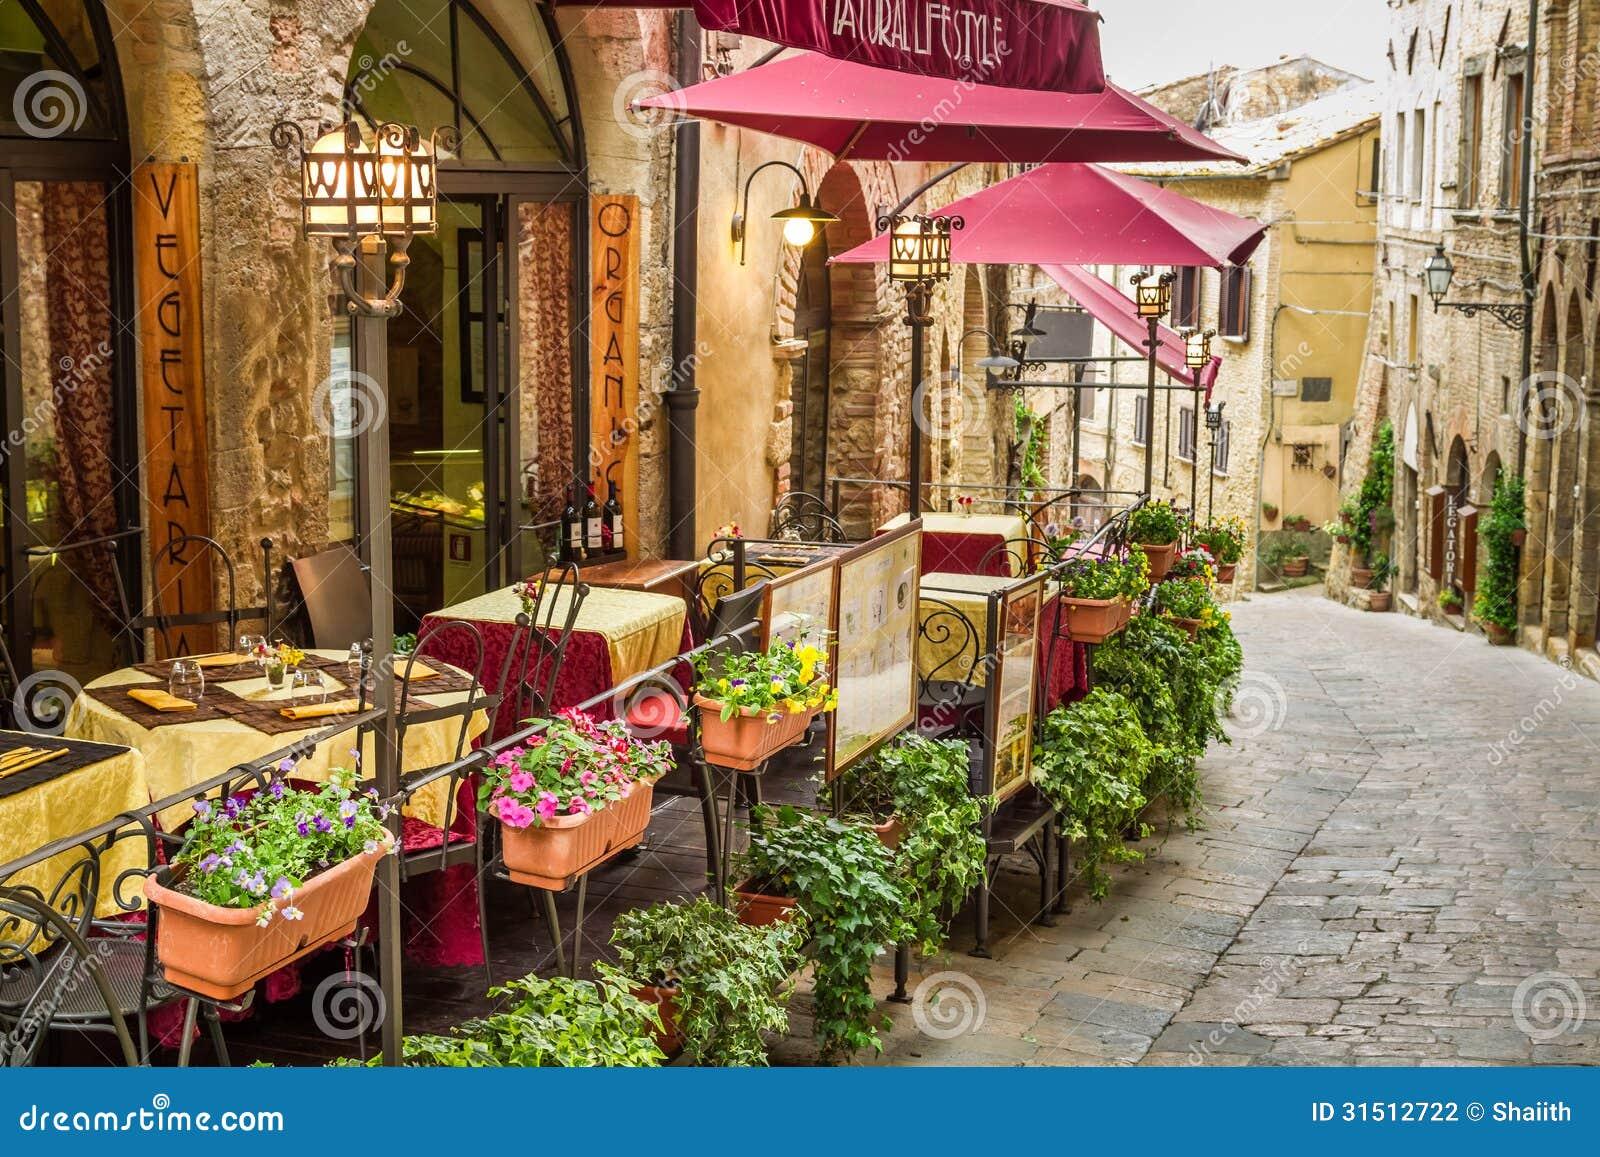 Italian Restaurant Old City